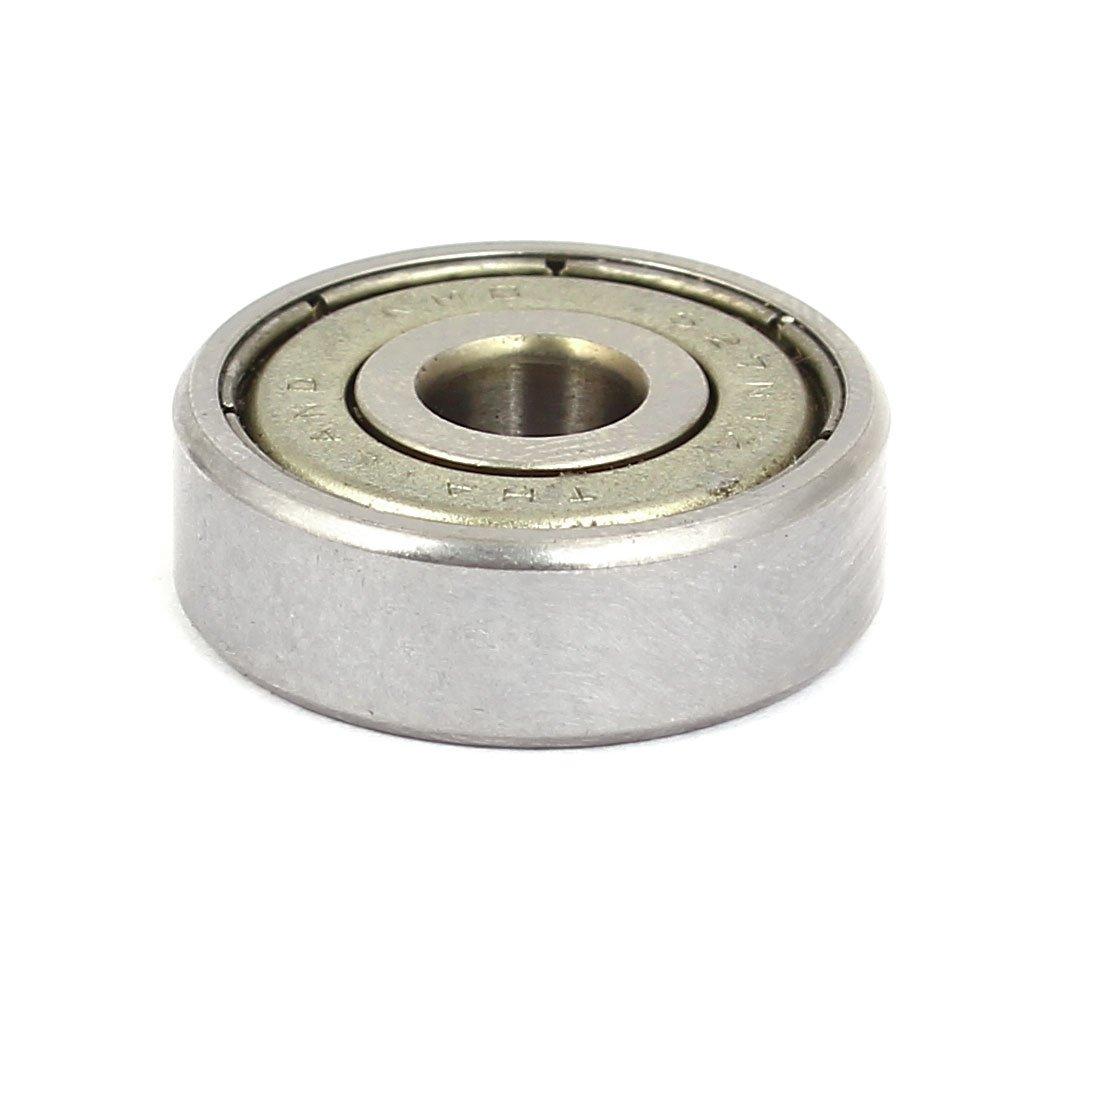 uxcell 6mm x 22mm x 7mm Steel Sealed Single Row Deep Groove Ball Wheel Bearings 5PCS